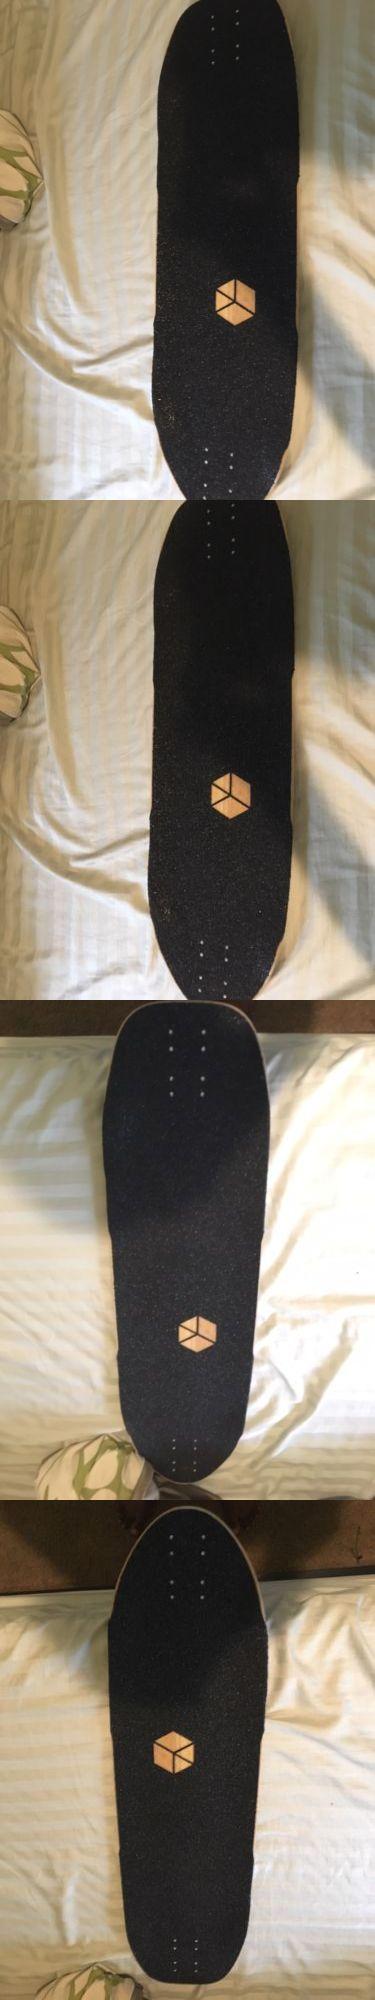 Decks 165944: Loaded Carbon Truncated Tesseract Longboard Deck Brand New -> BUY IT NOW ONLY: $250 on eBay!